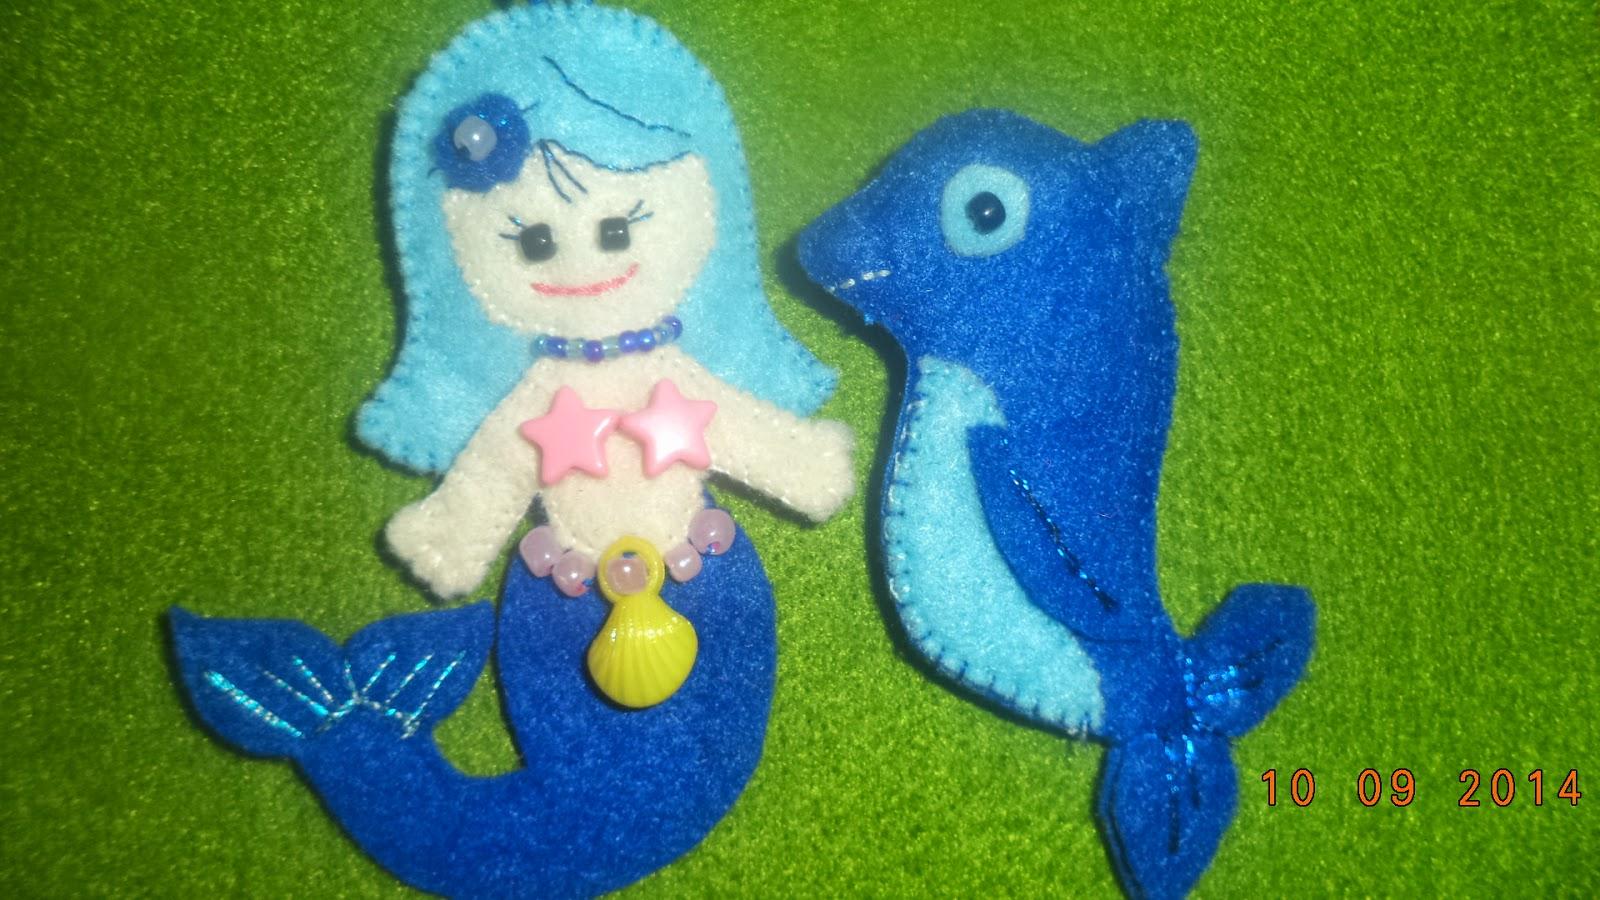 Дельфин и Русалка)))